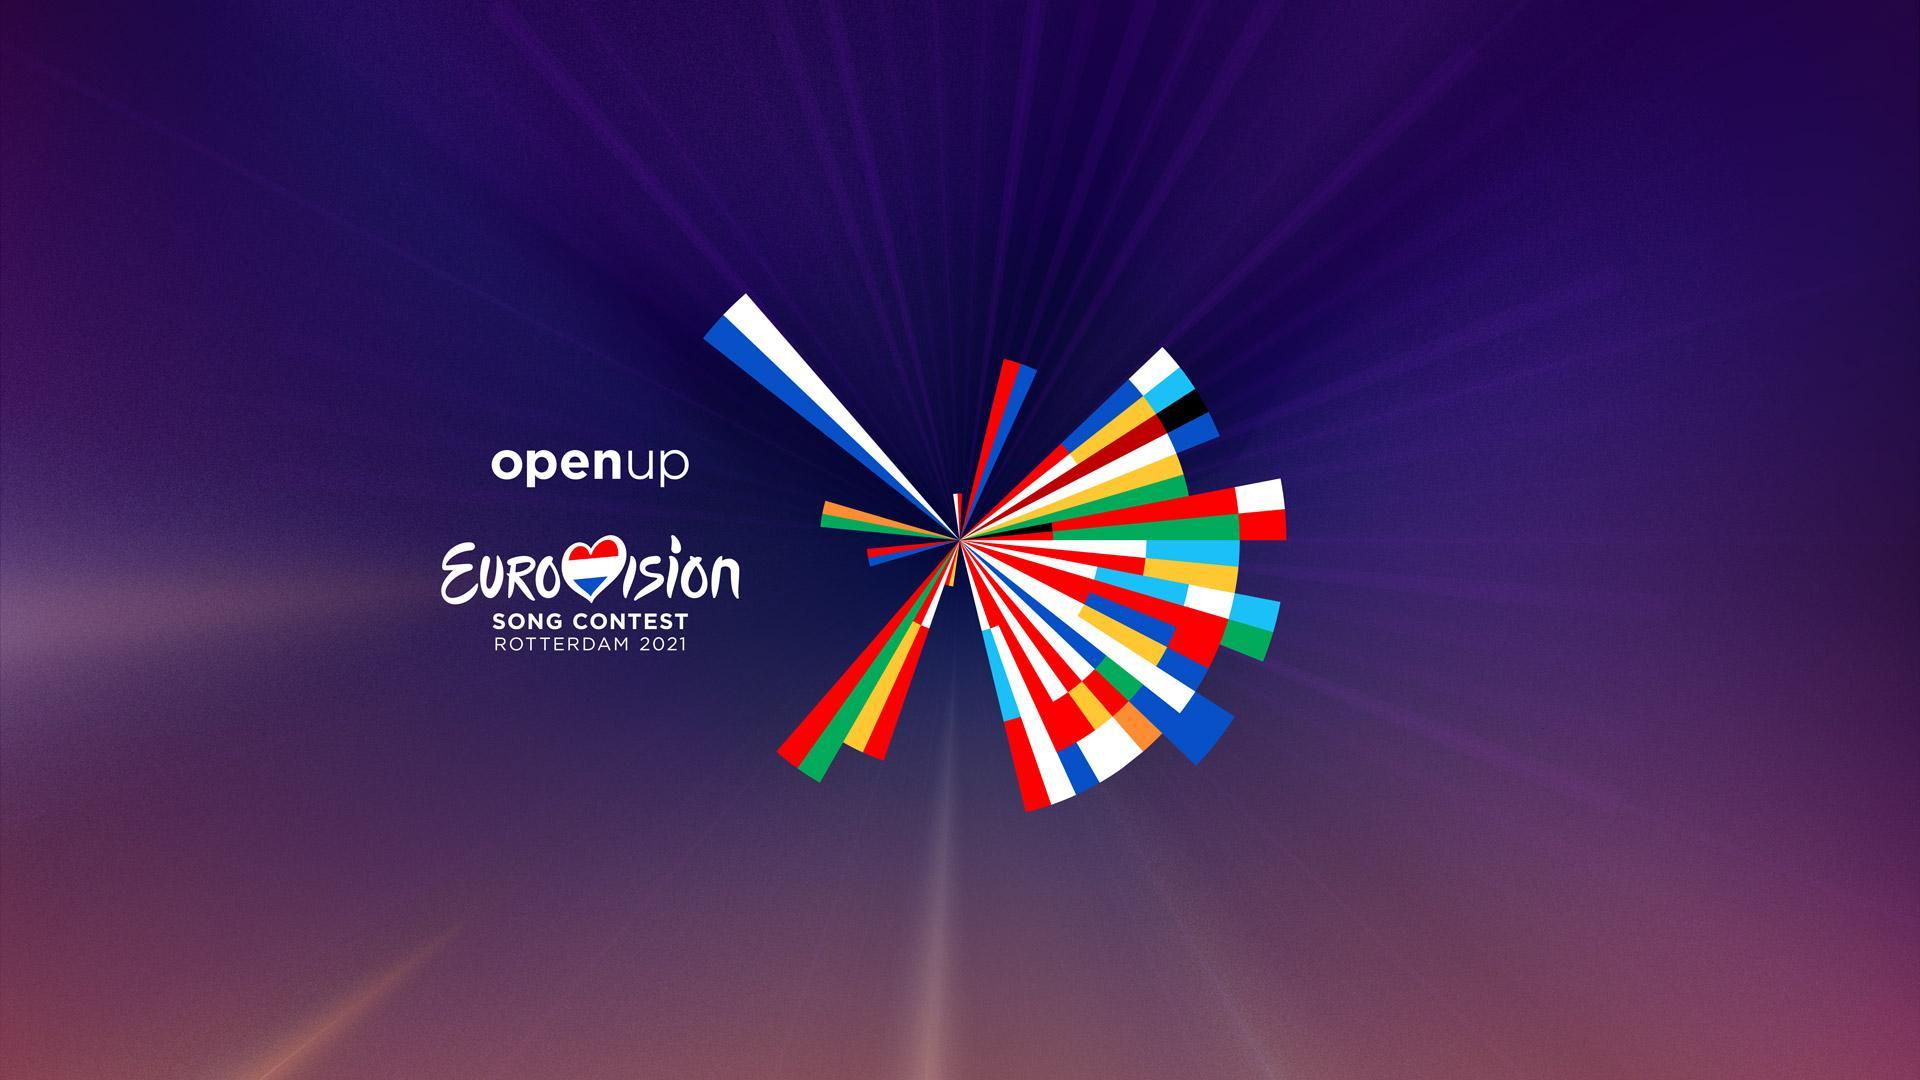 Vernieuwd logo Eurovisie Songfestival 2021: opnieuw samenkomen in Rotterdam